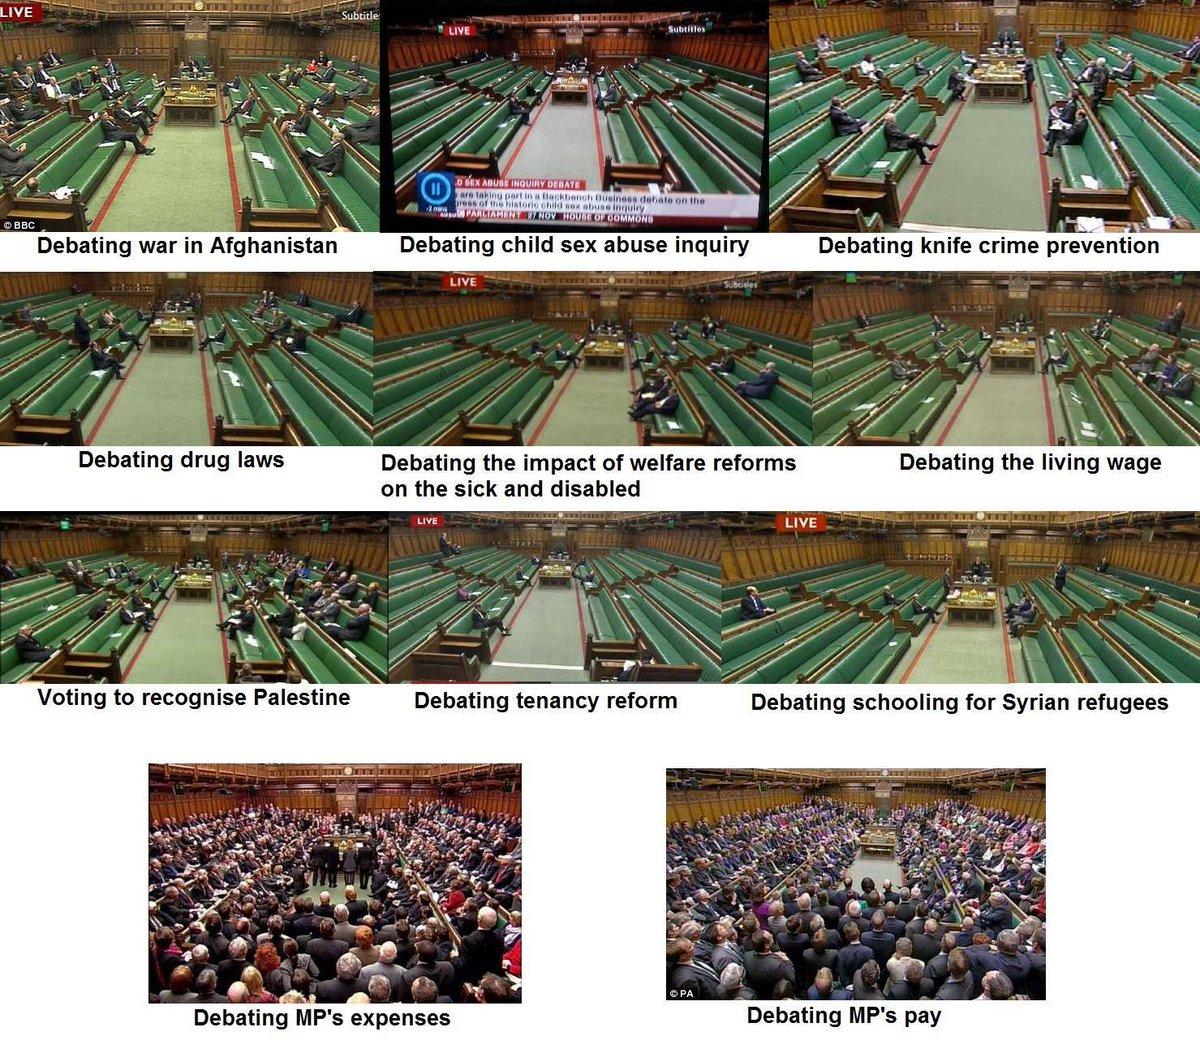 Estaría bien hacer una así del parlamento español RT @CLEARUK: What do our MPs really care about? http://t.co/79TgS5mixD vía @jaimenovoa